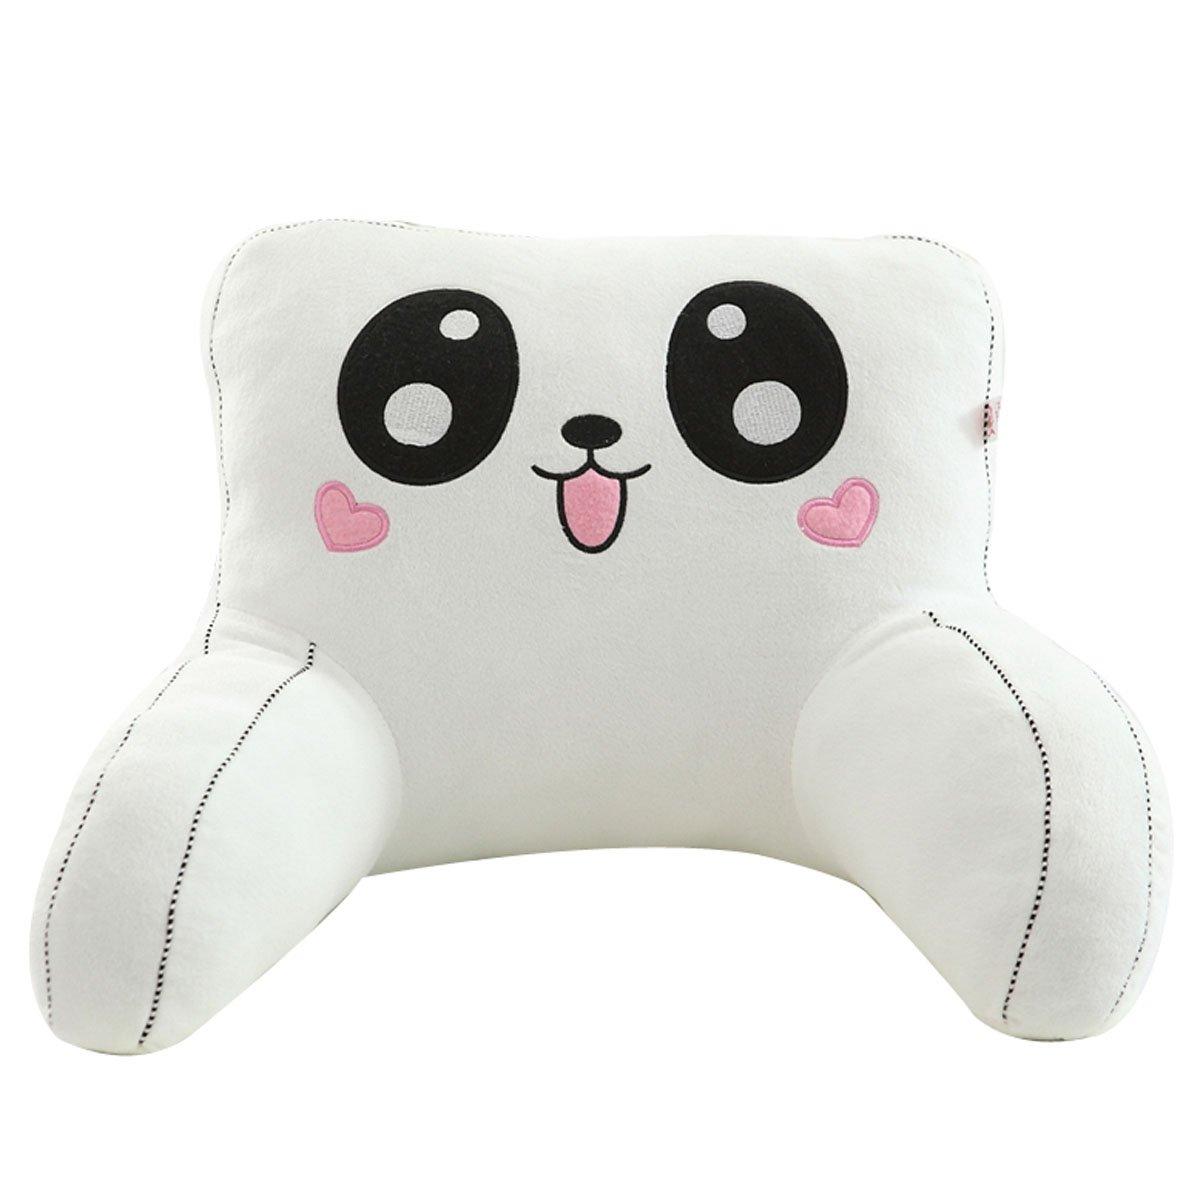 Adorable Panda Lumbar Support Backrest Pillow Waist Seat Back Cushion Pillow in Home Office School Car